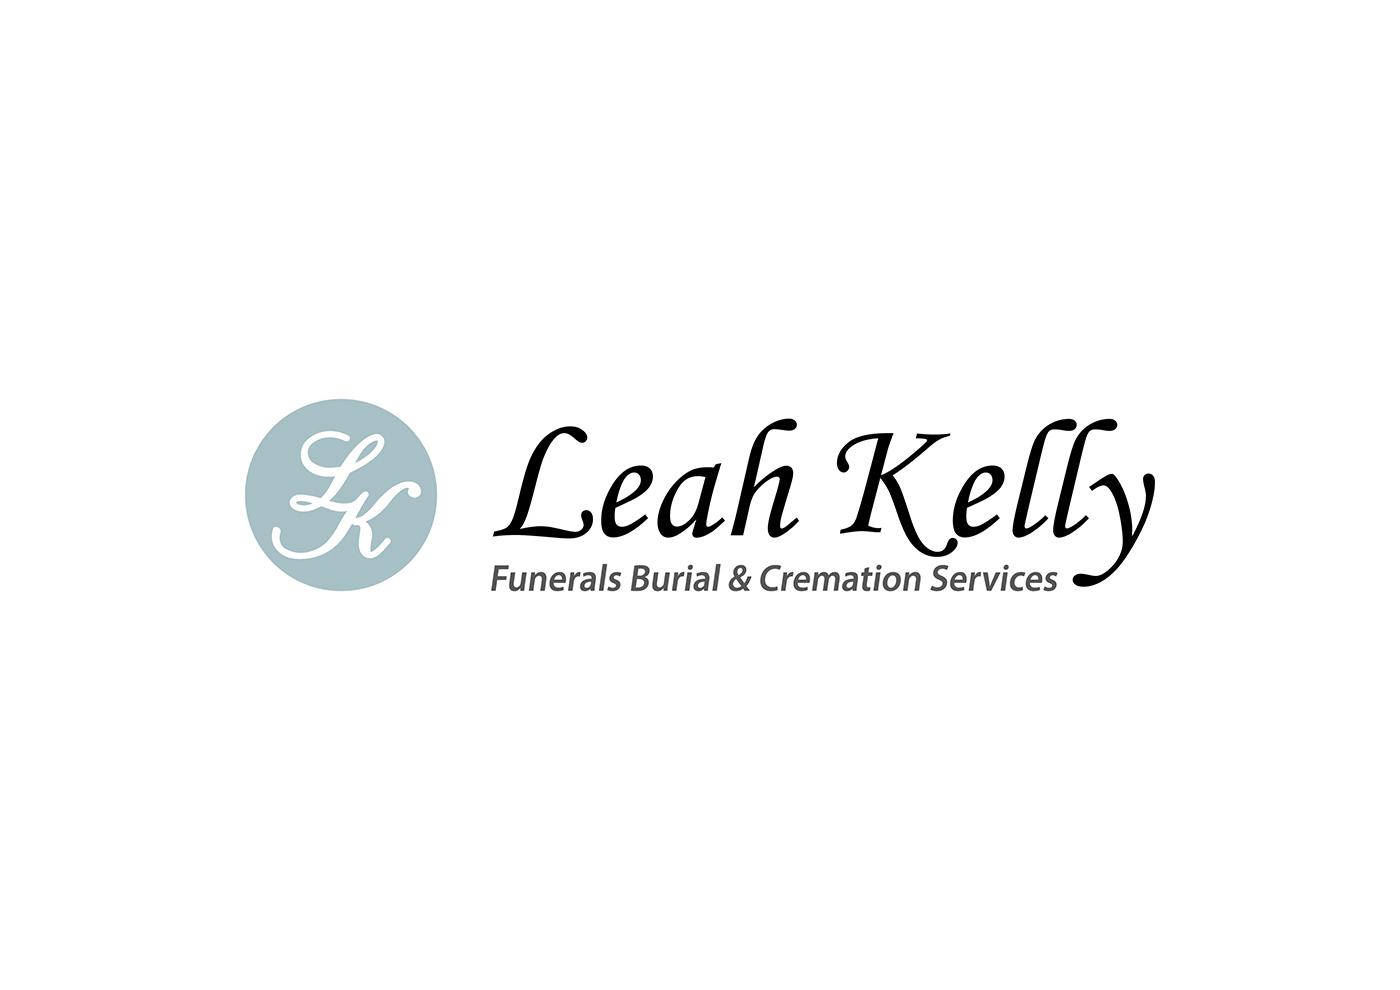 Funeral Home Logos Designs Home Design